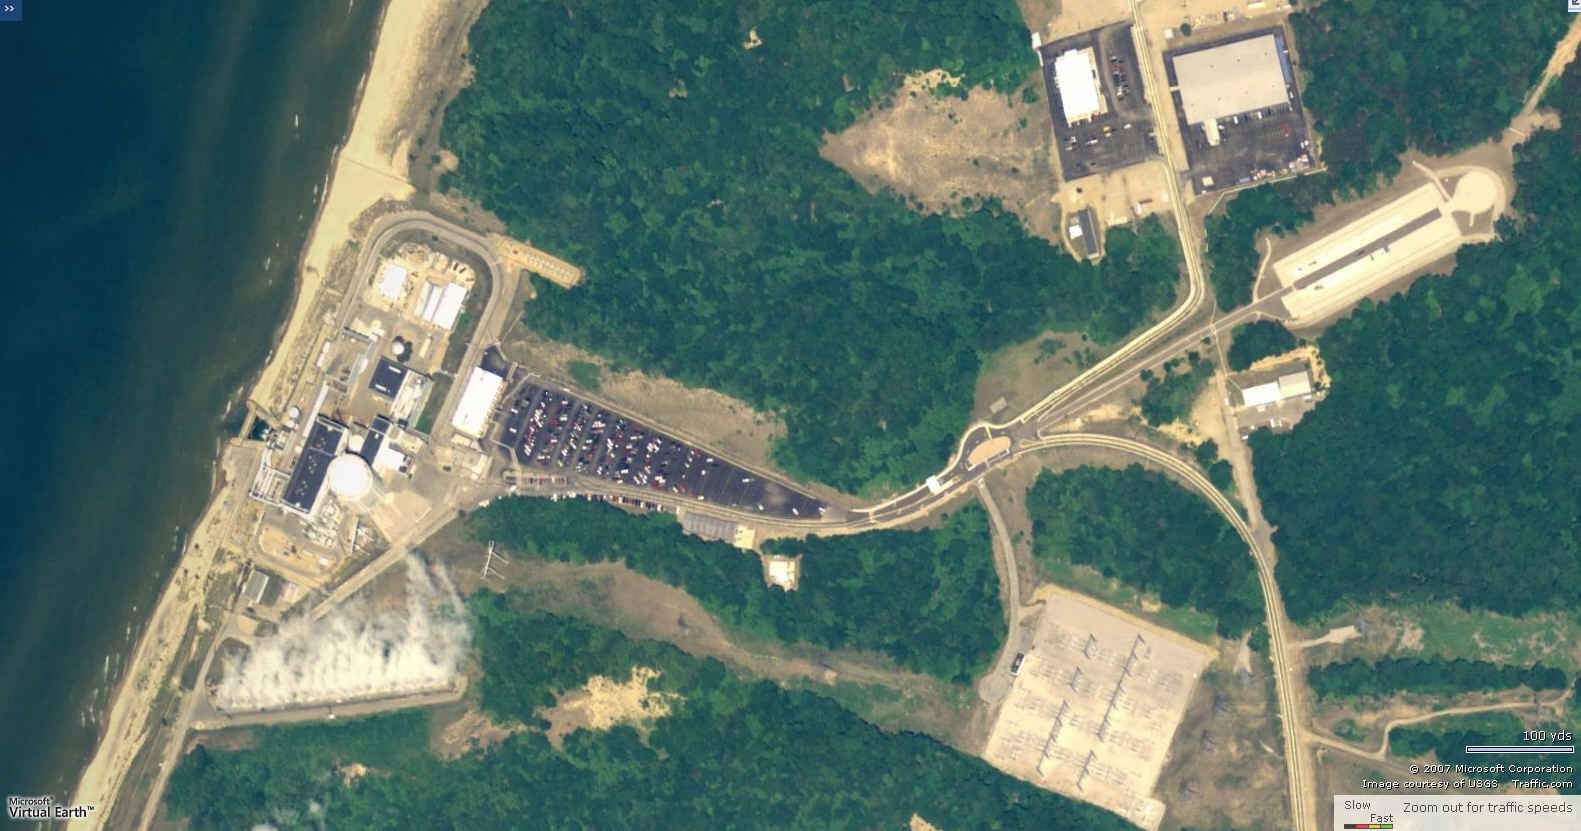 Eyeballing 104 Nuclear Reactors at 63 Power Plants